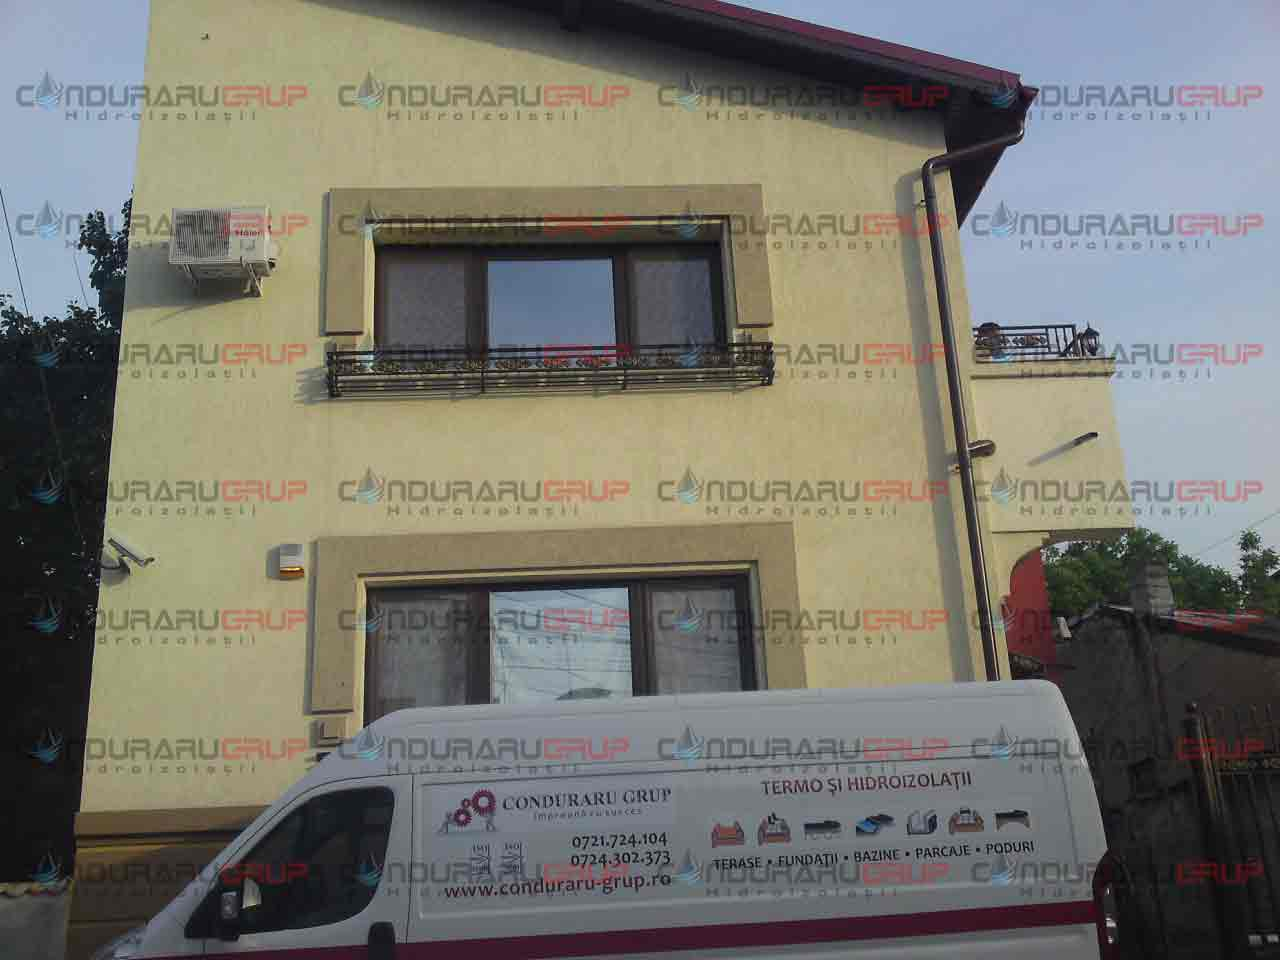 Imobil proprietate personala CONDURARU GRUP - Poza 1